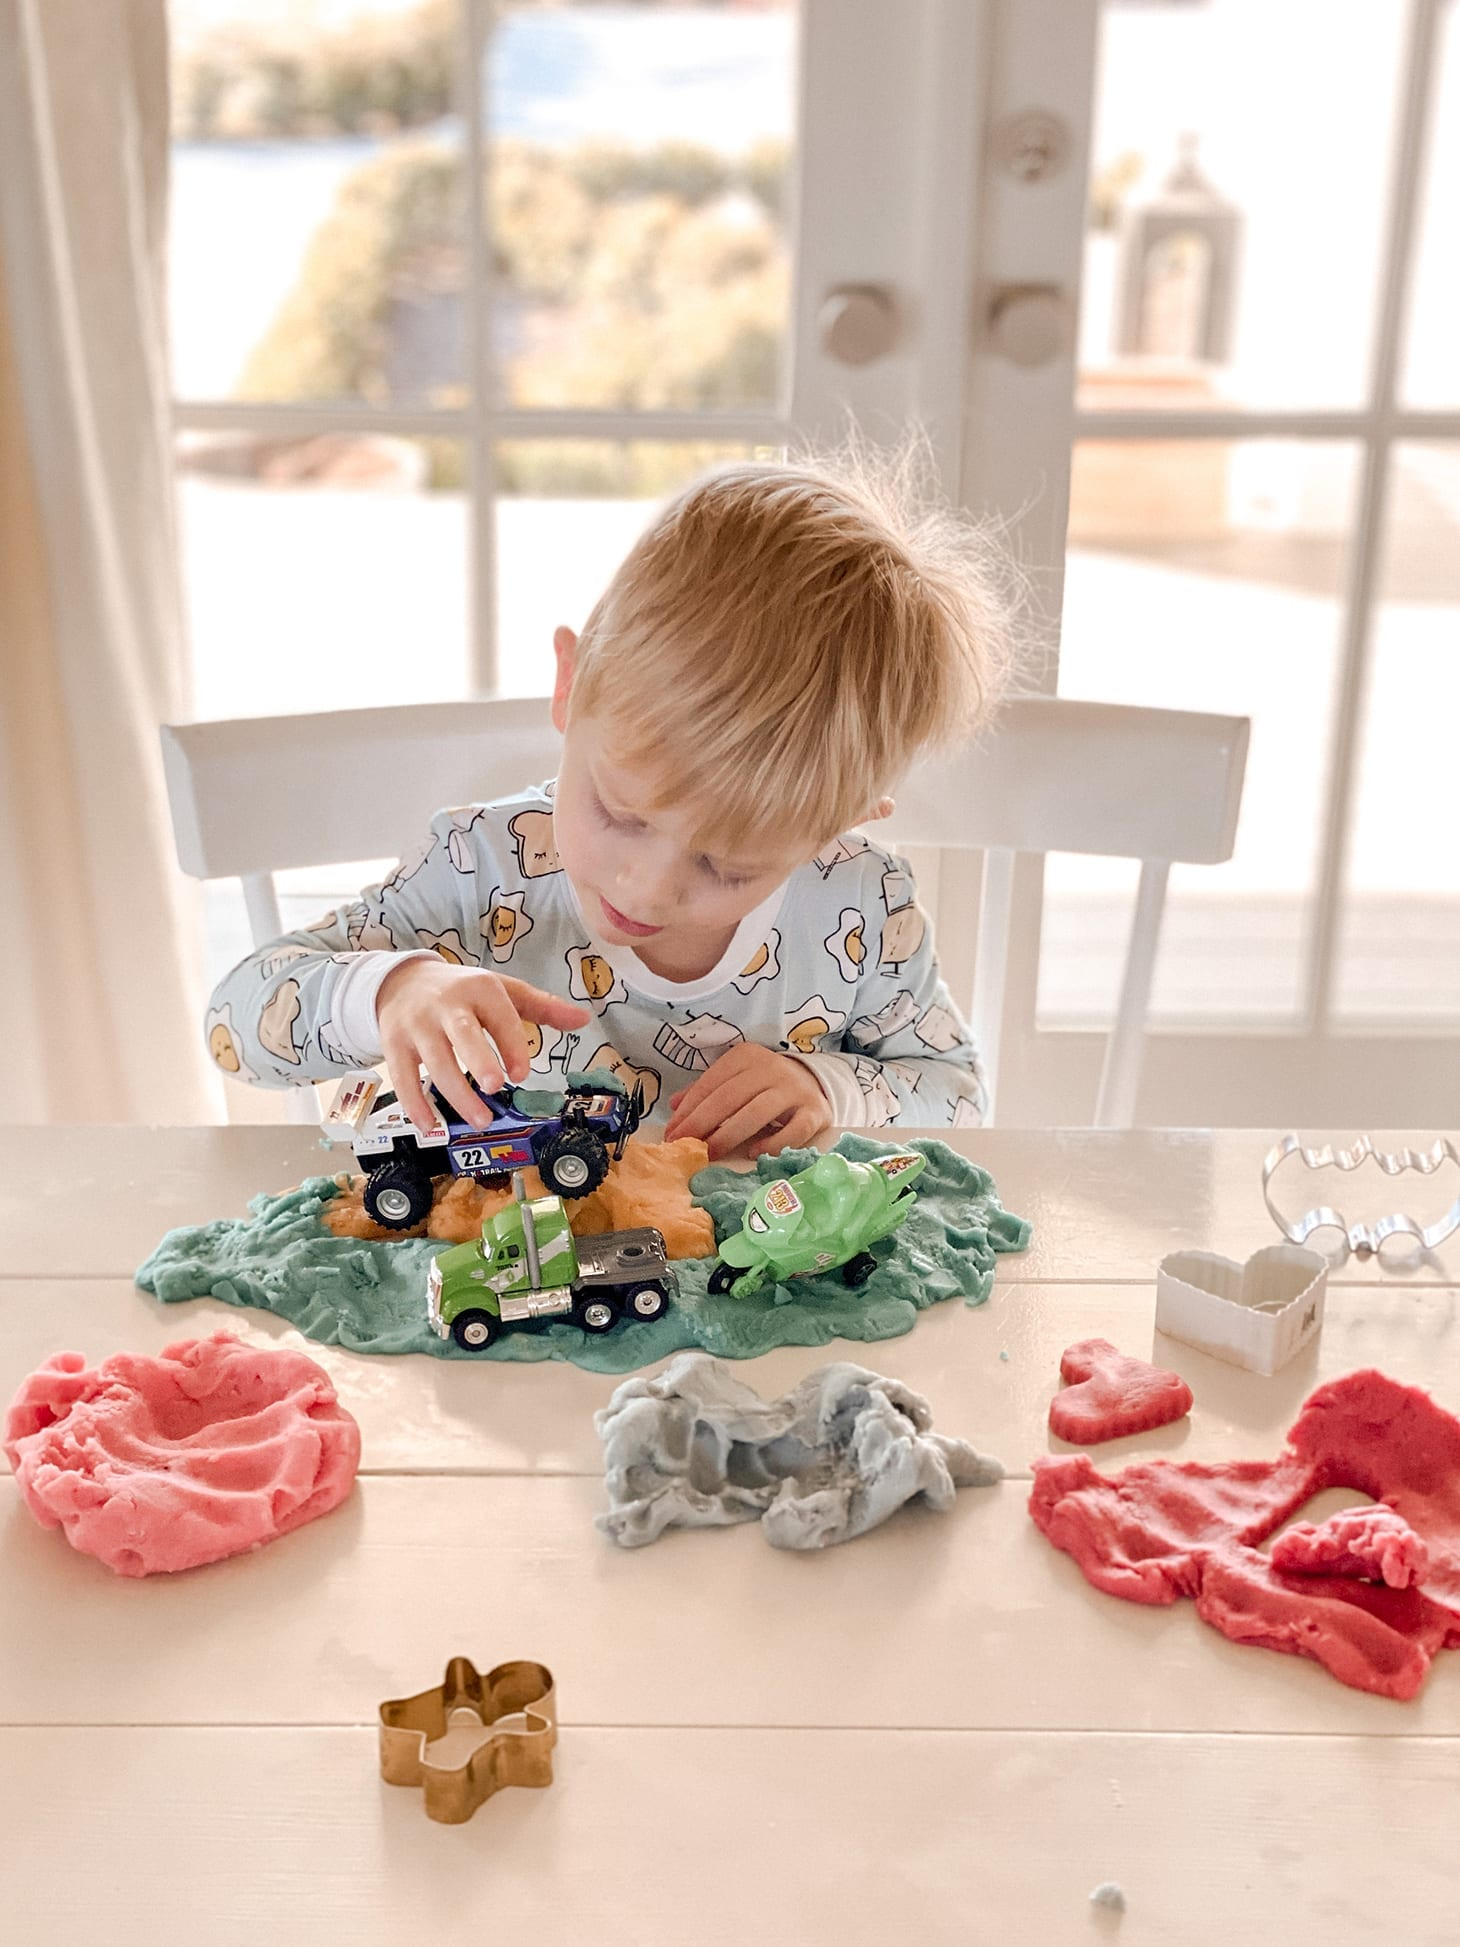 Jillian Harris' Son Playing with Play Dough